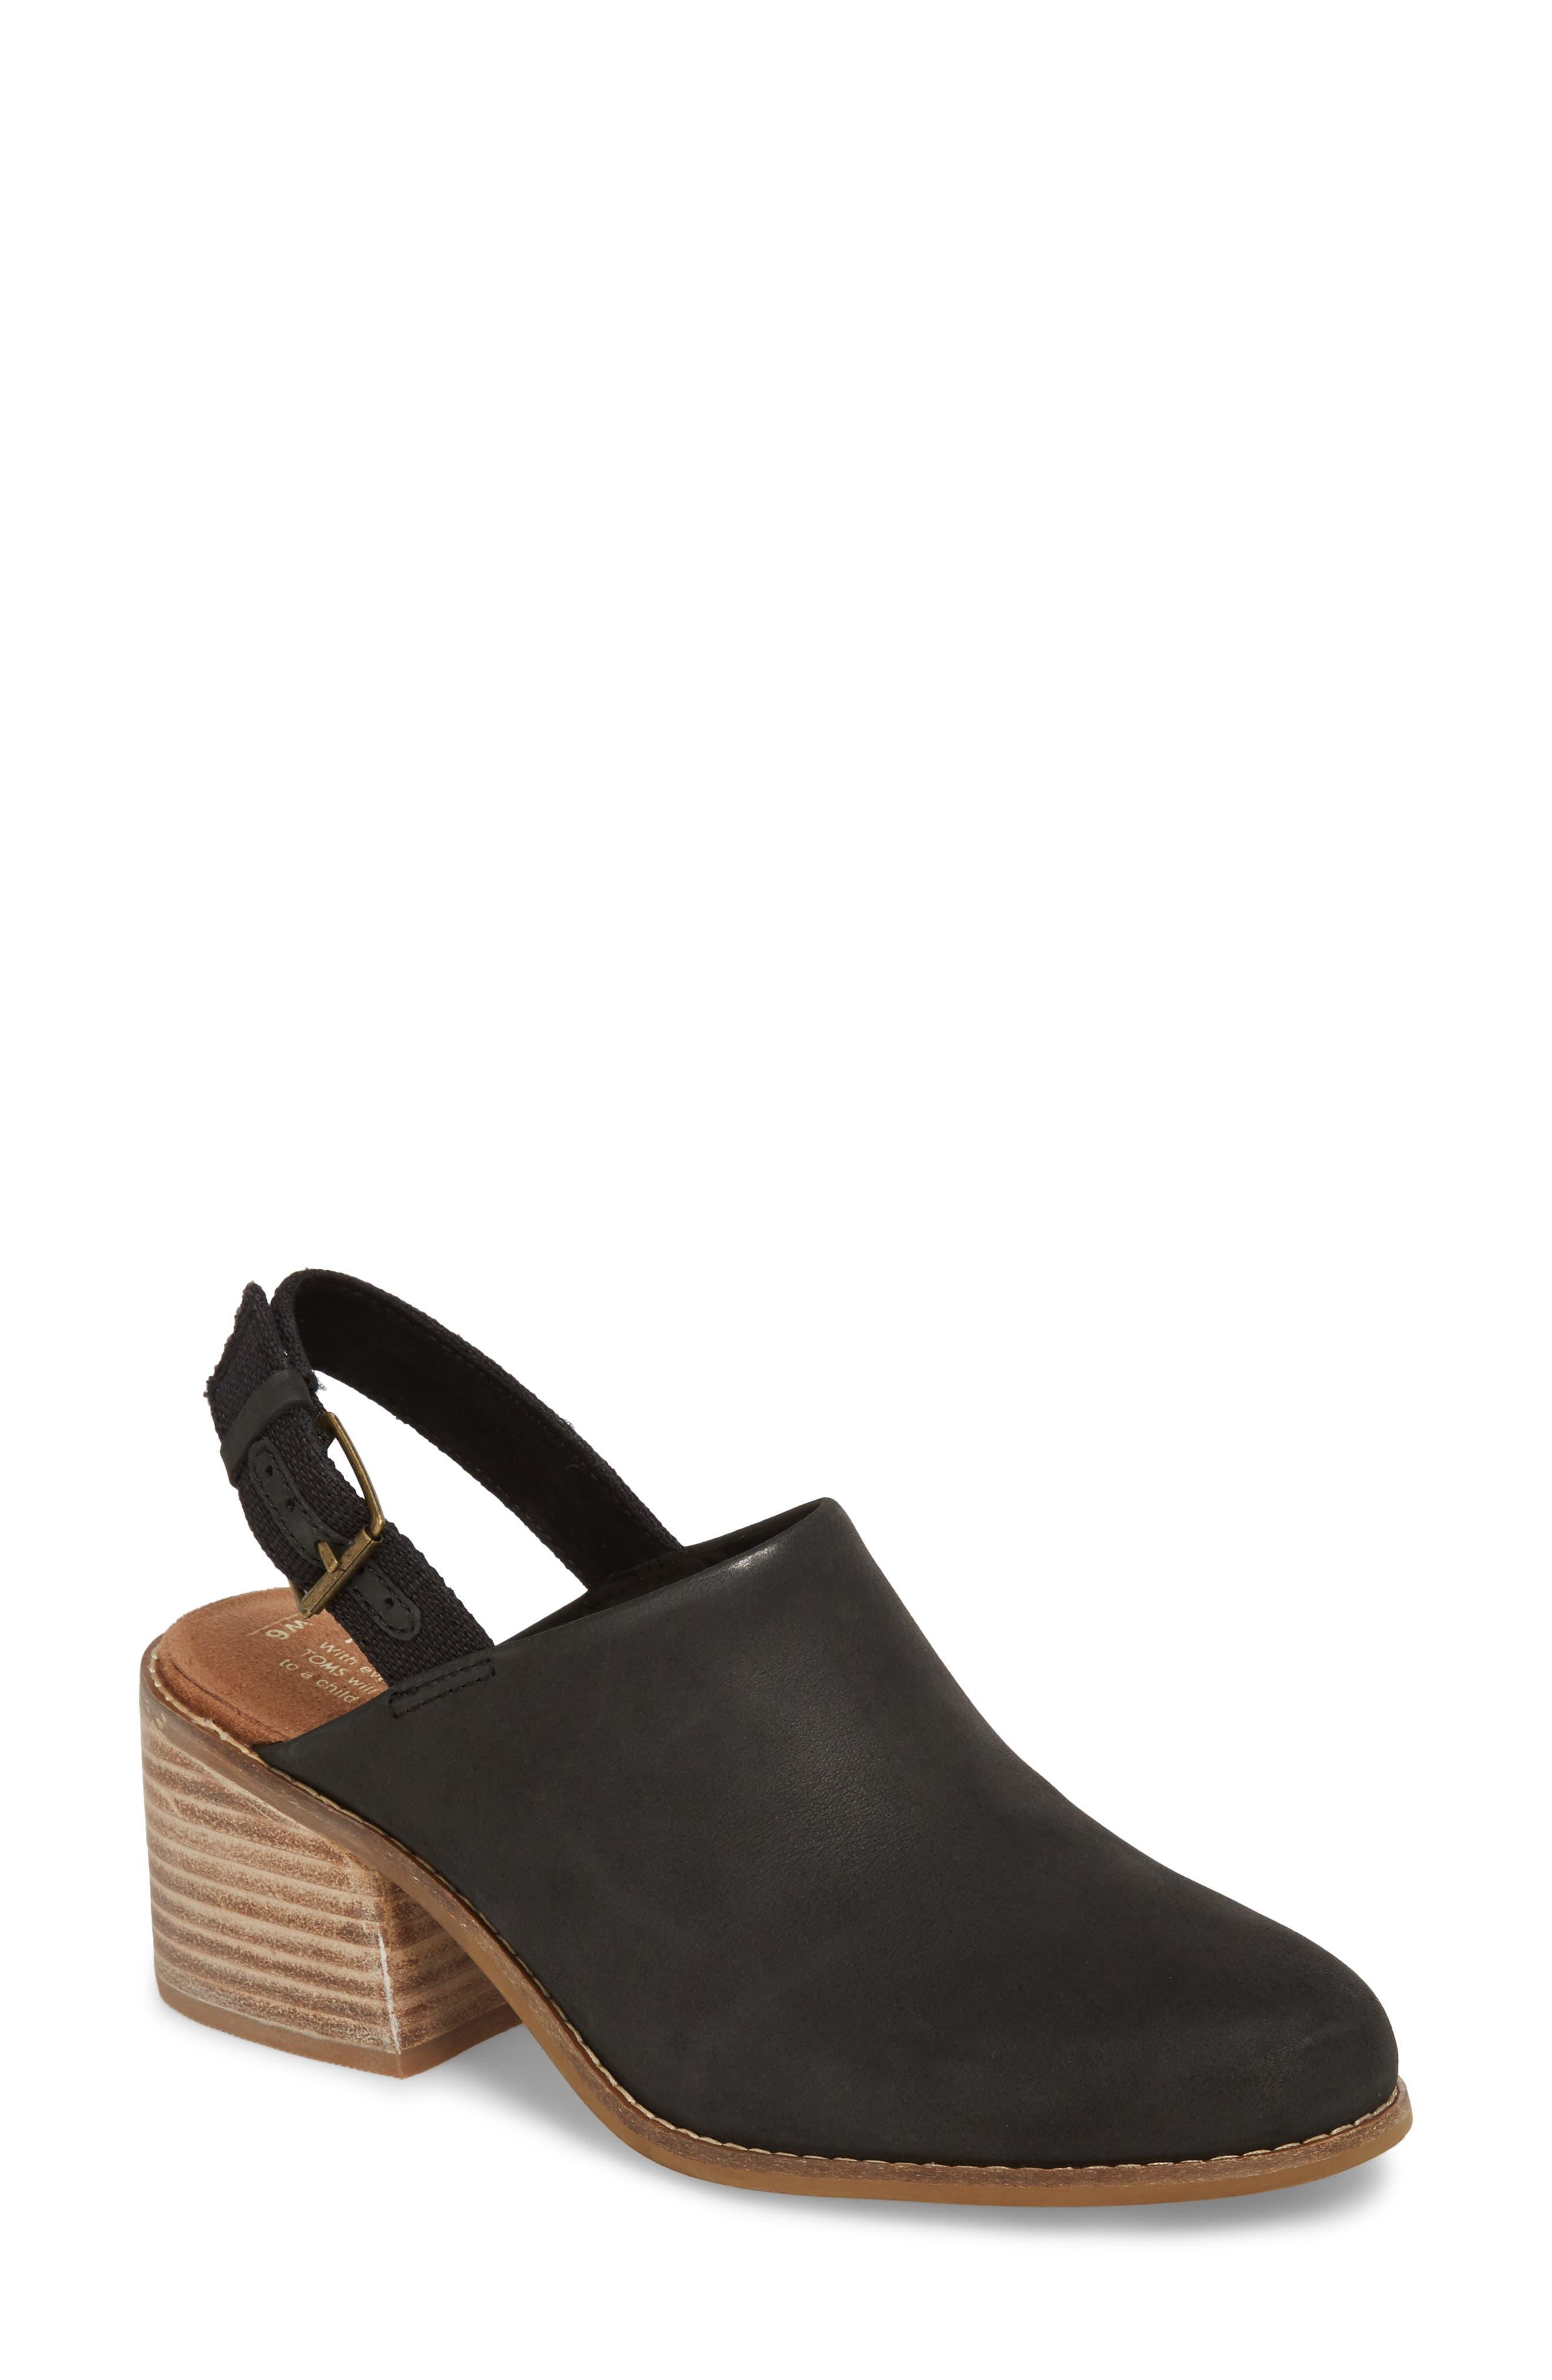 Leila Slingback Sandal,                             Main thumbnail 1, color,                             Black Leather